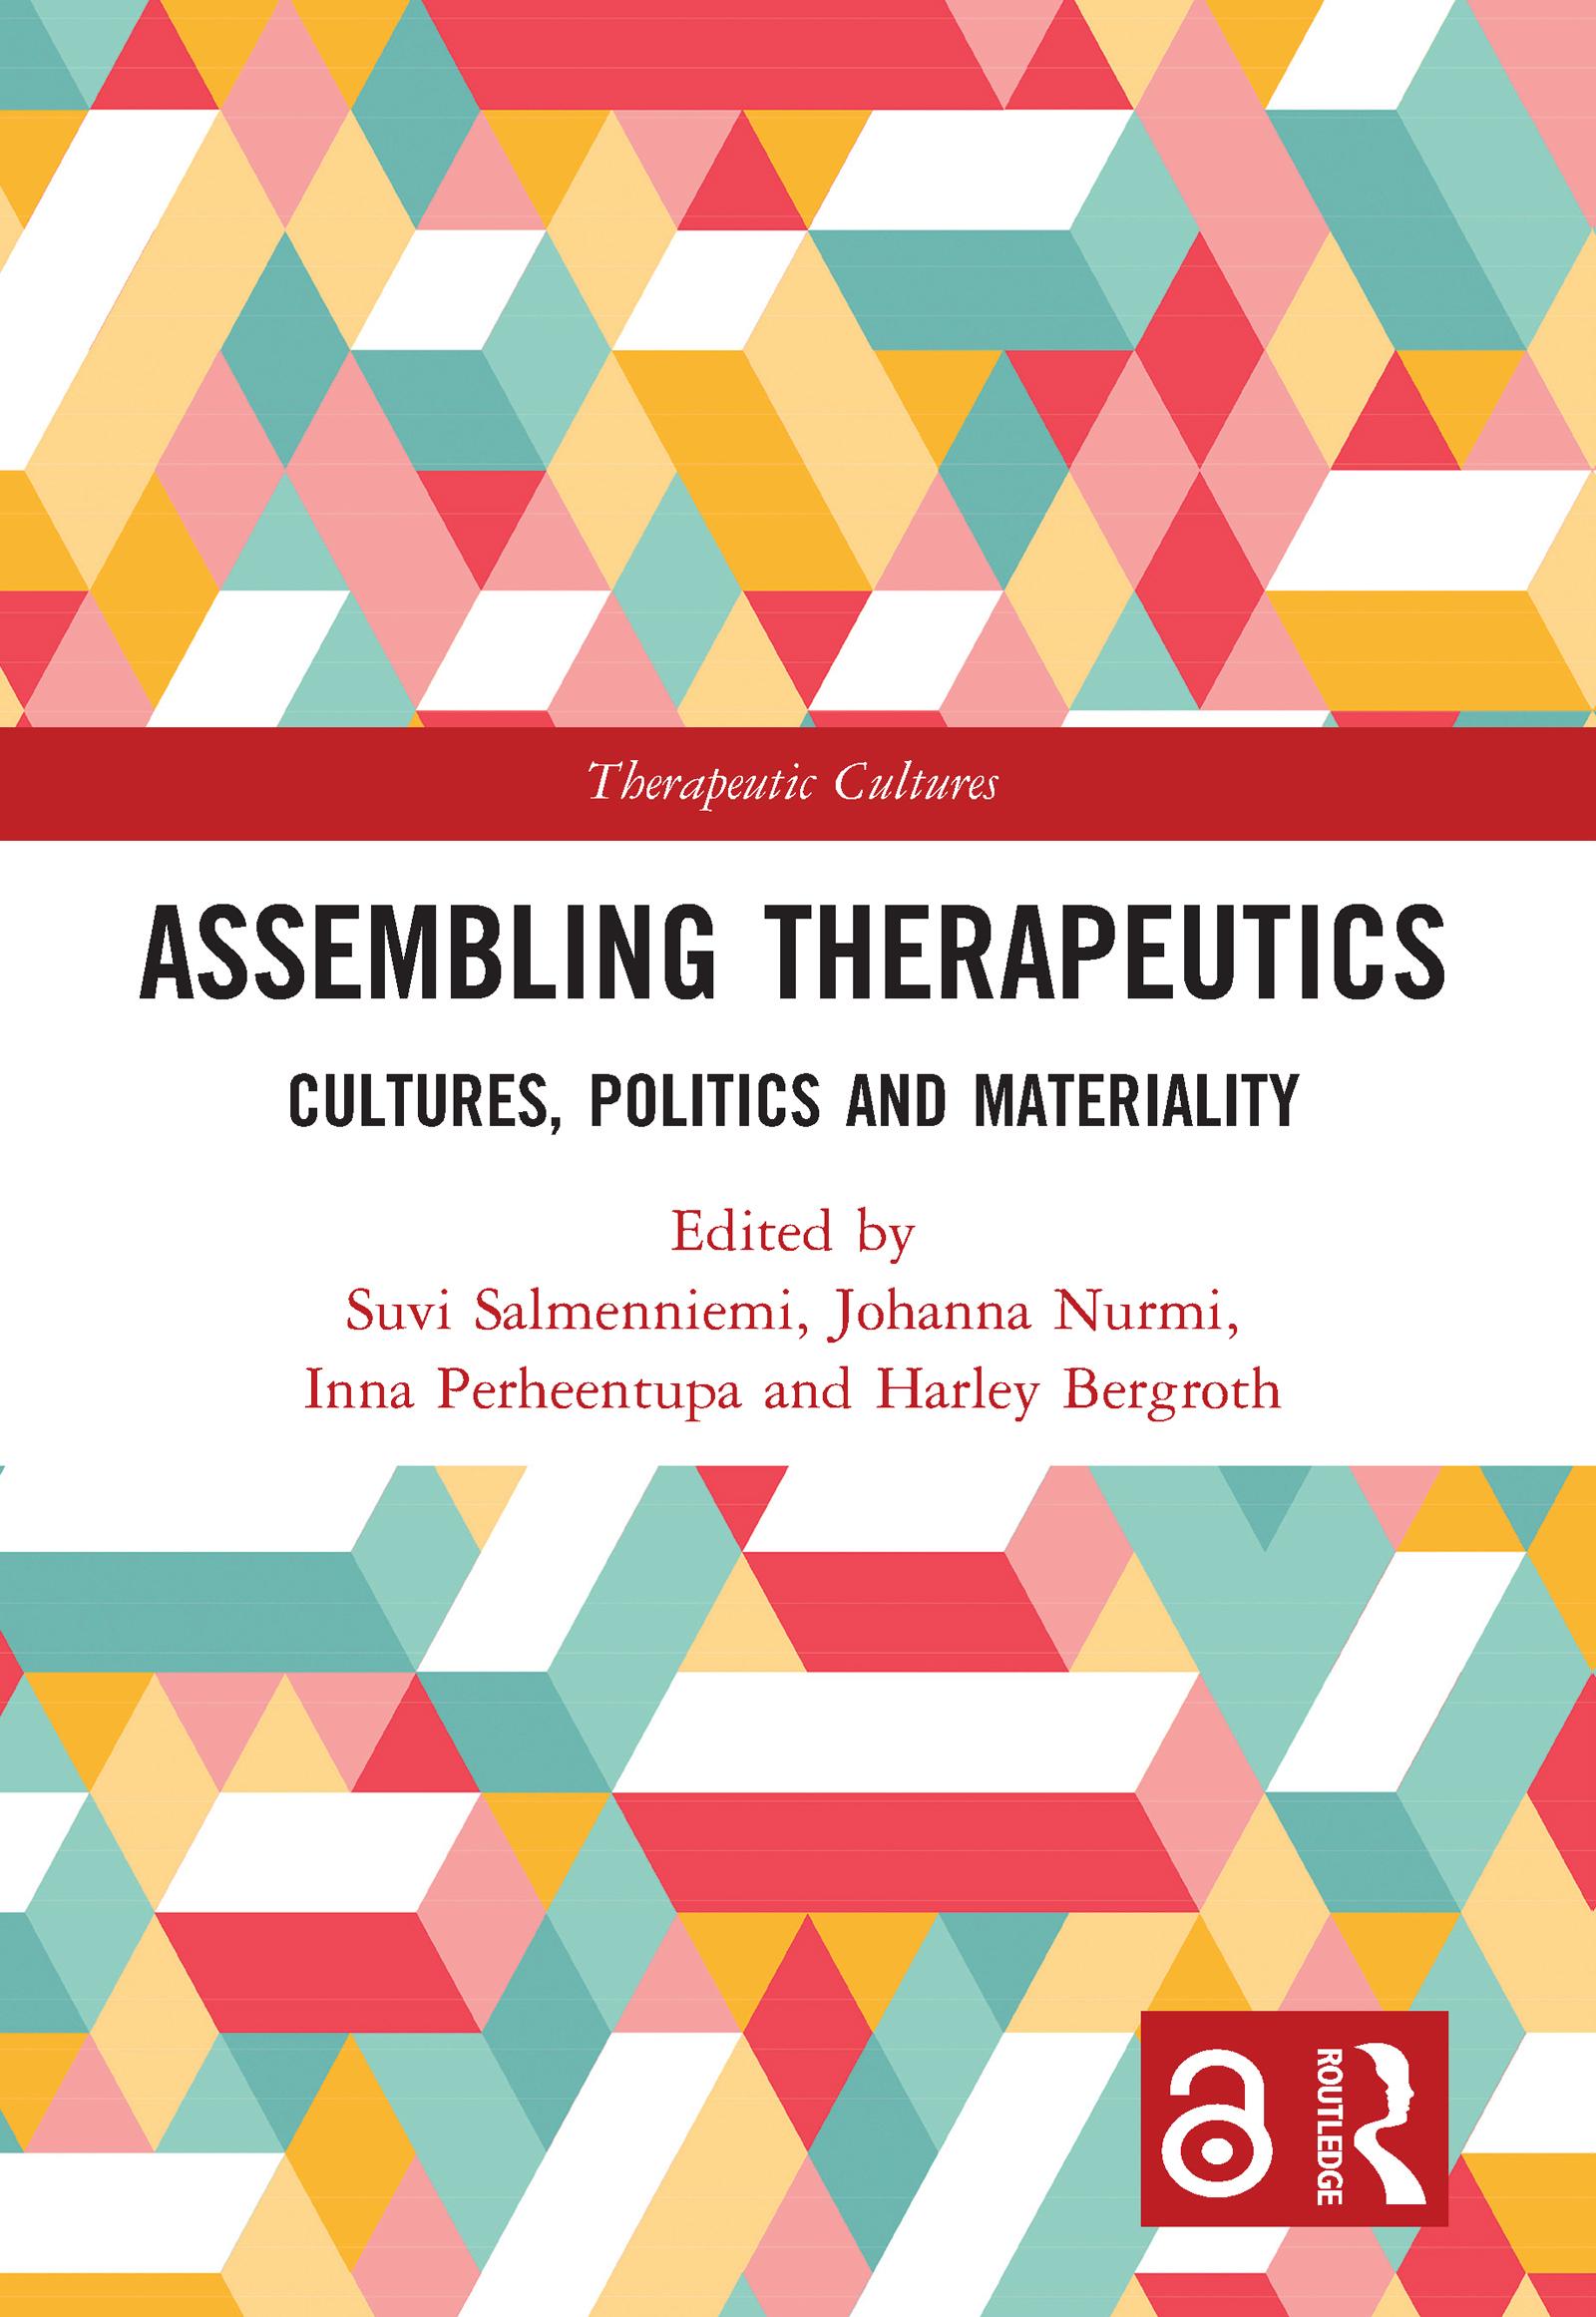 Assembling Therapeutics (Open Access)